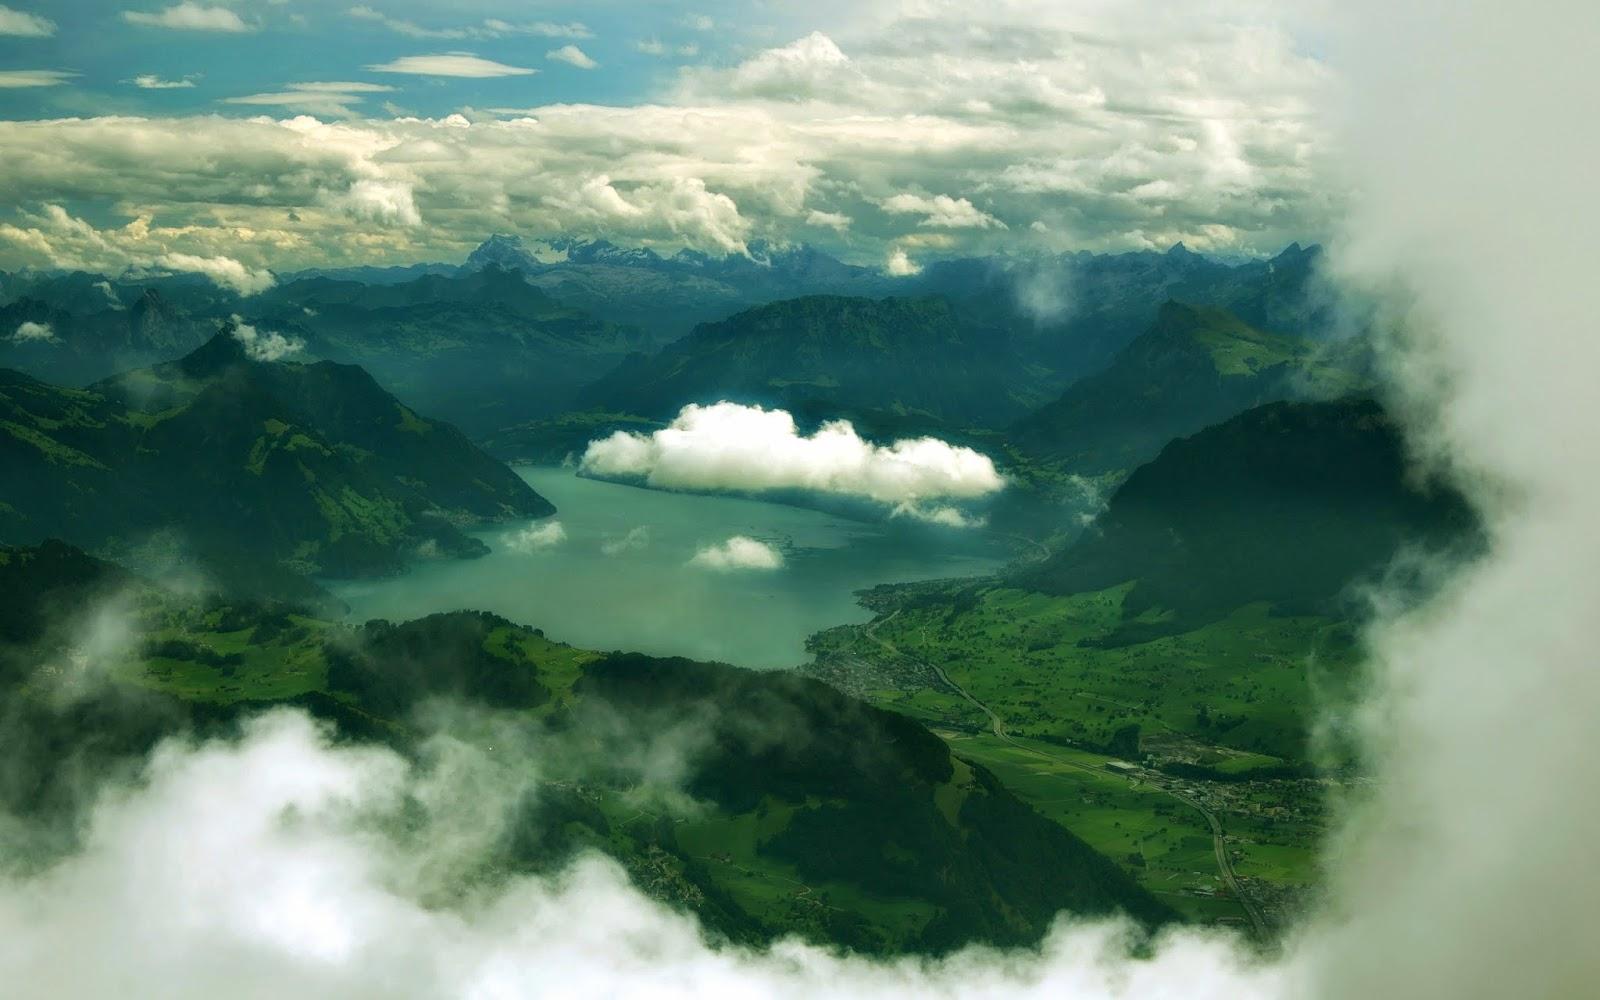 Cloud in Sky Mountain River Wallpaper